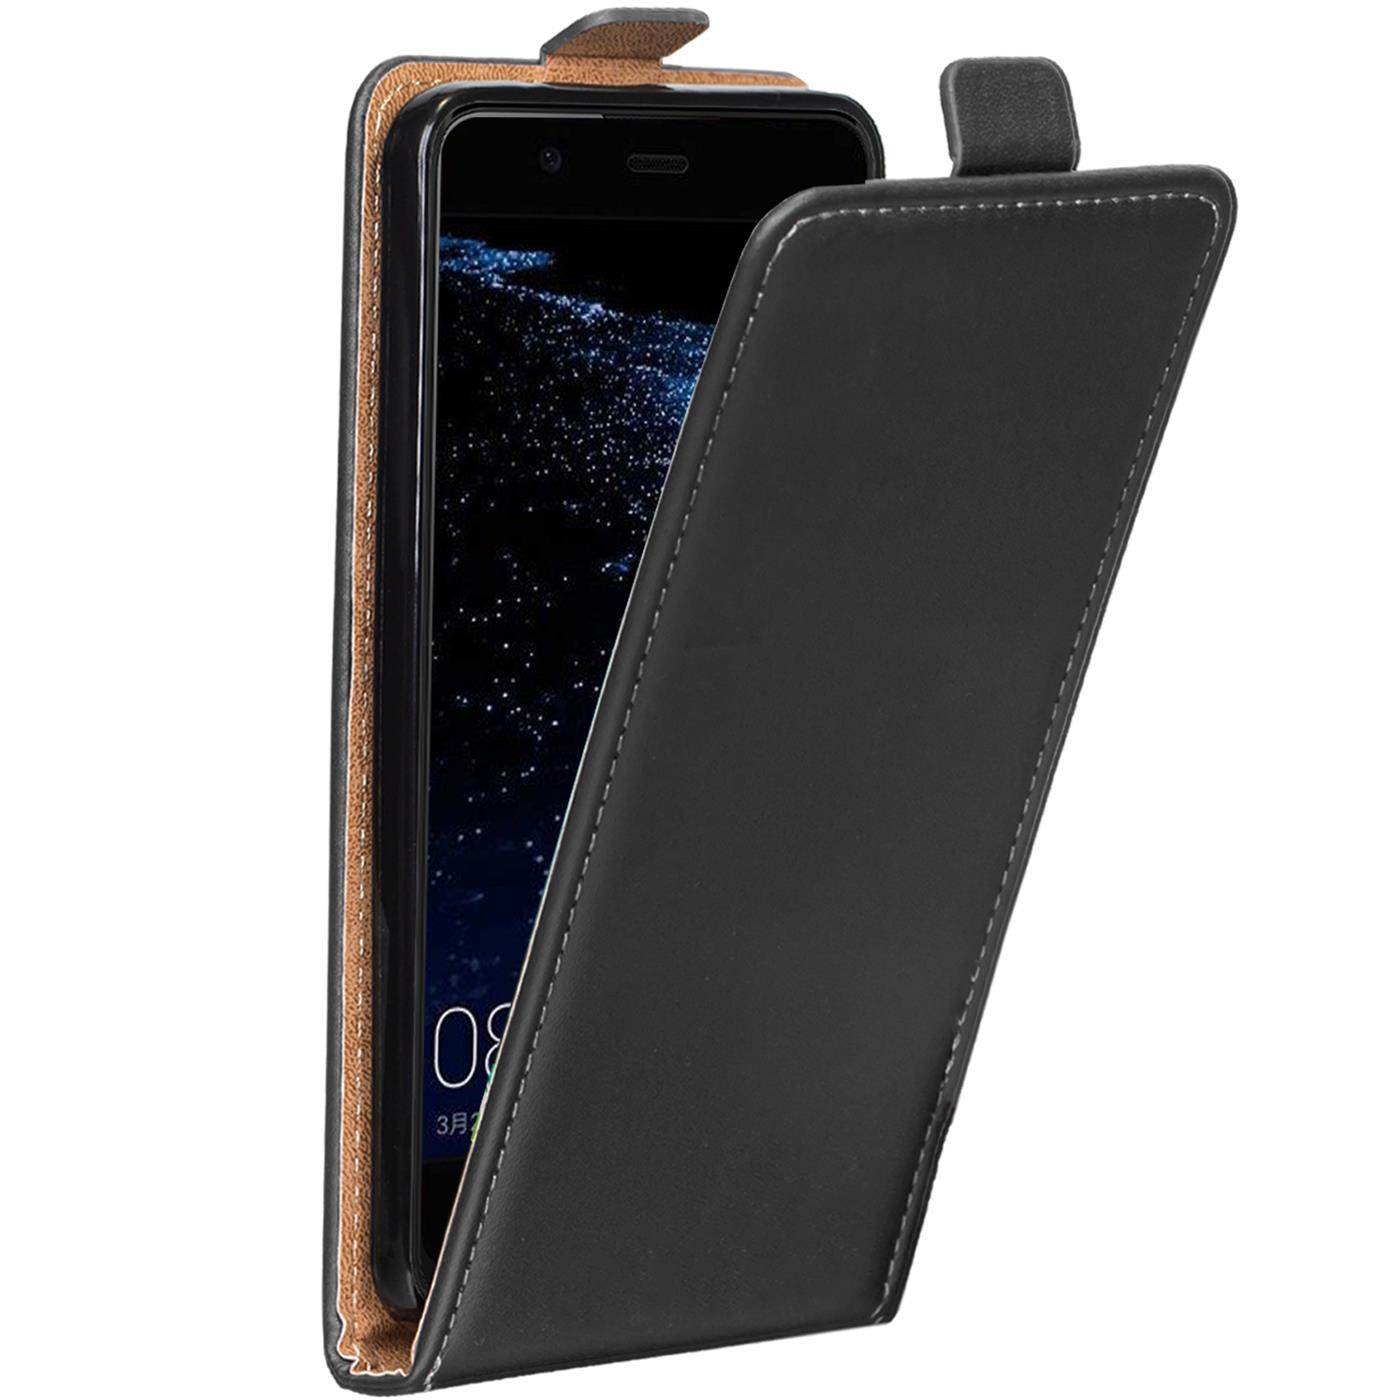 Etui Schutz Hülle Huawei Honor Flip Case Handy Tasche Cover Klapphülle Bumper